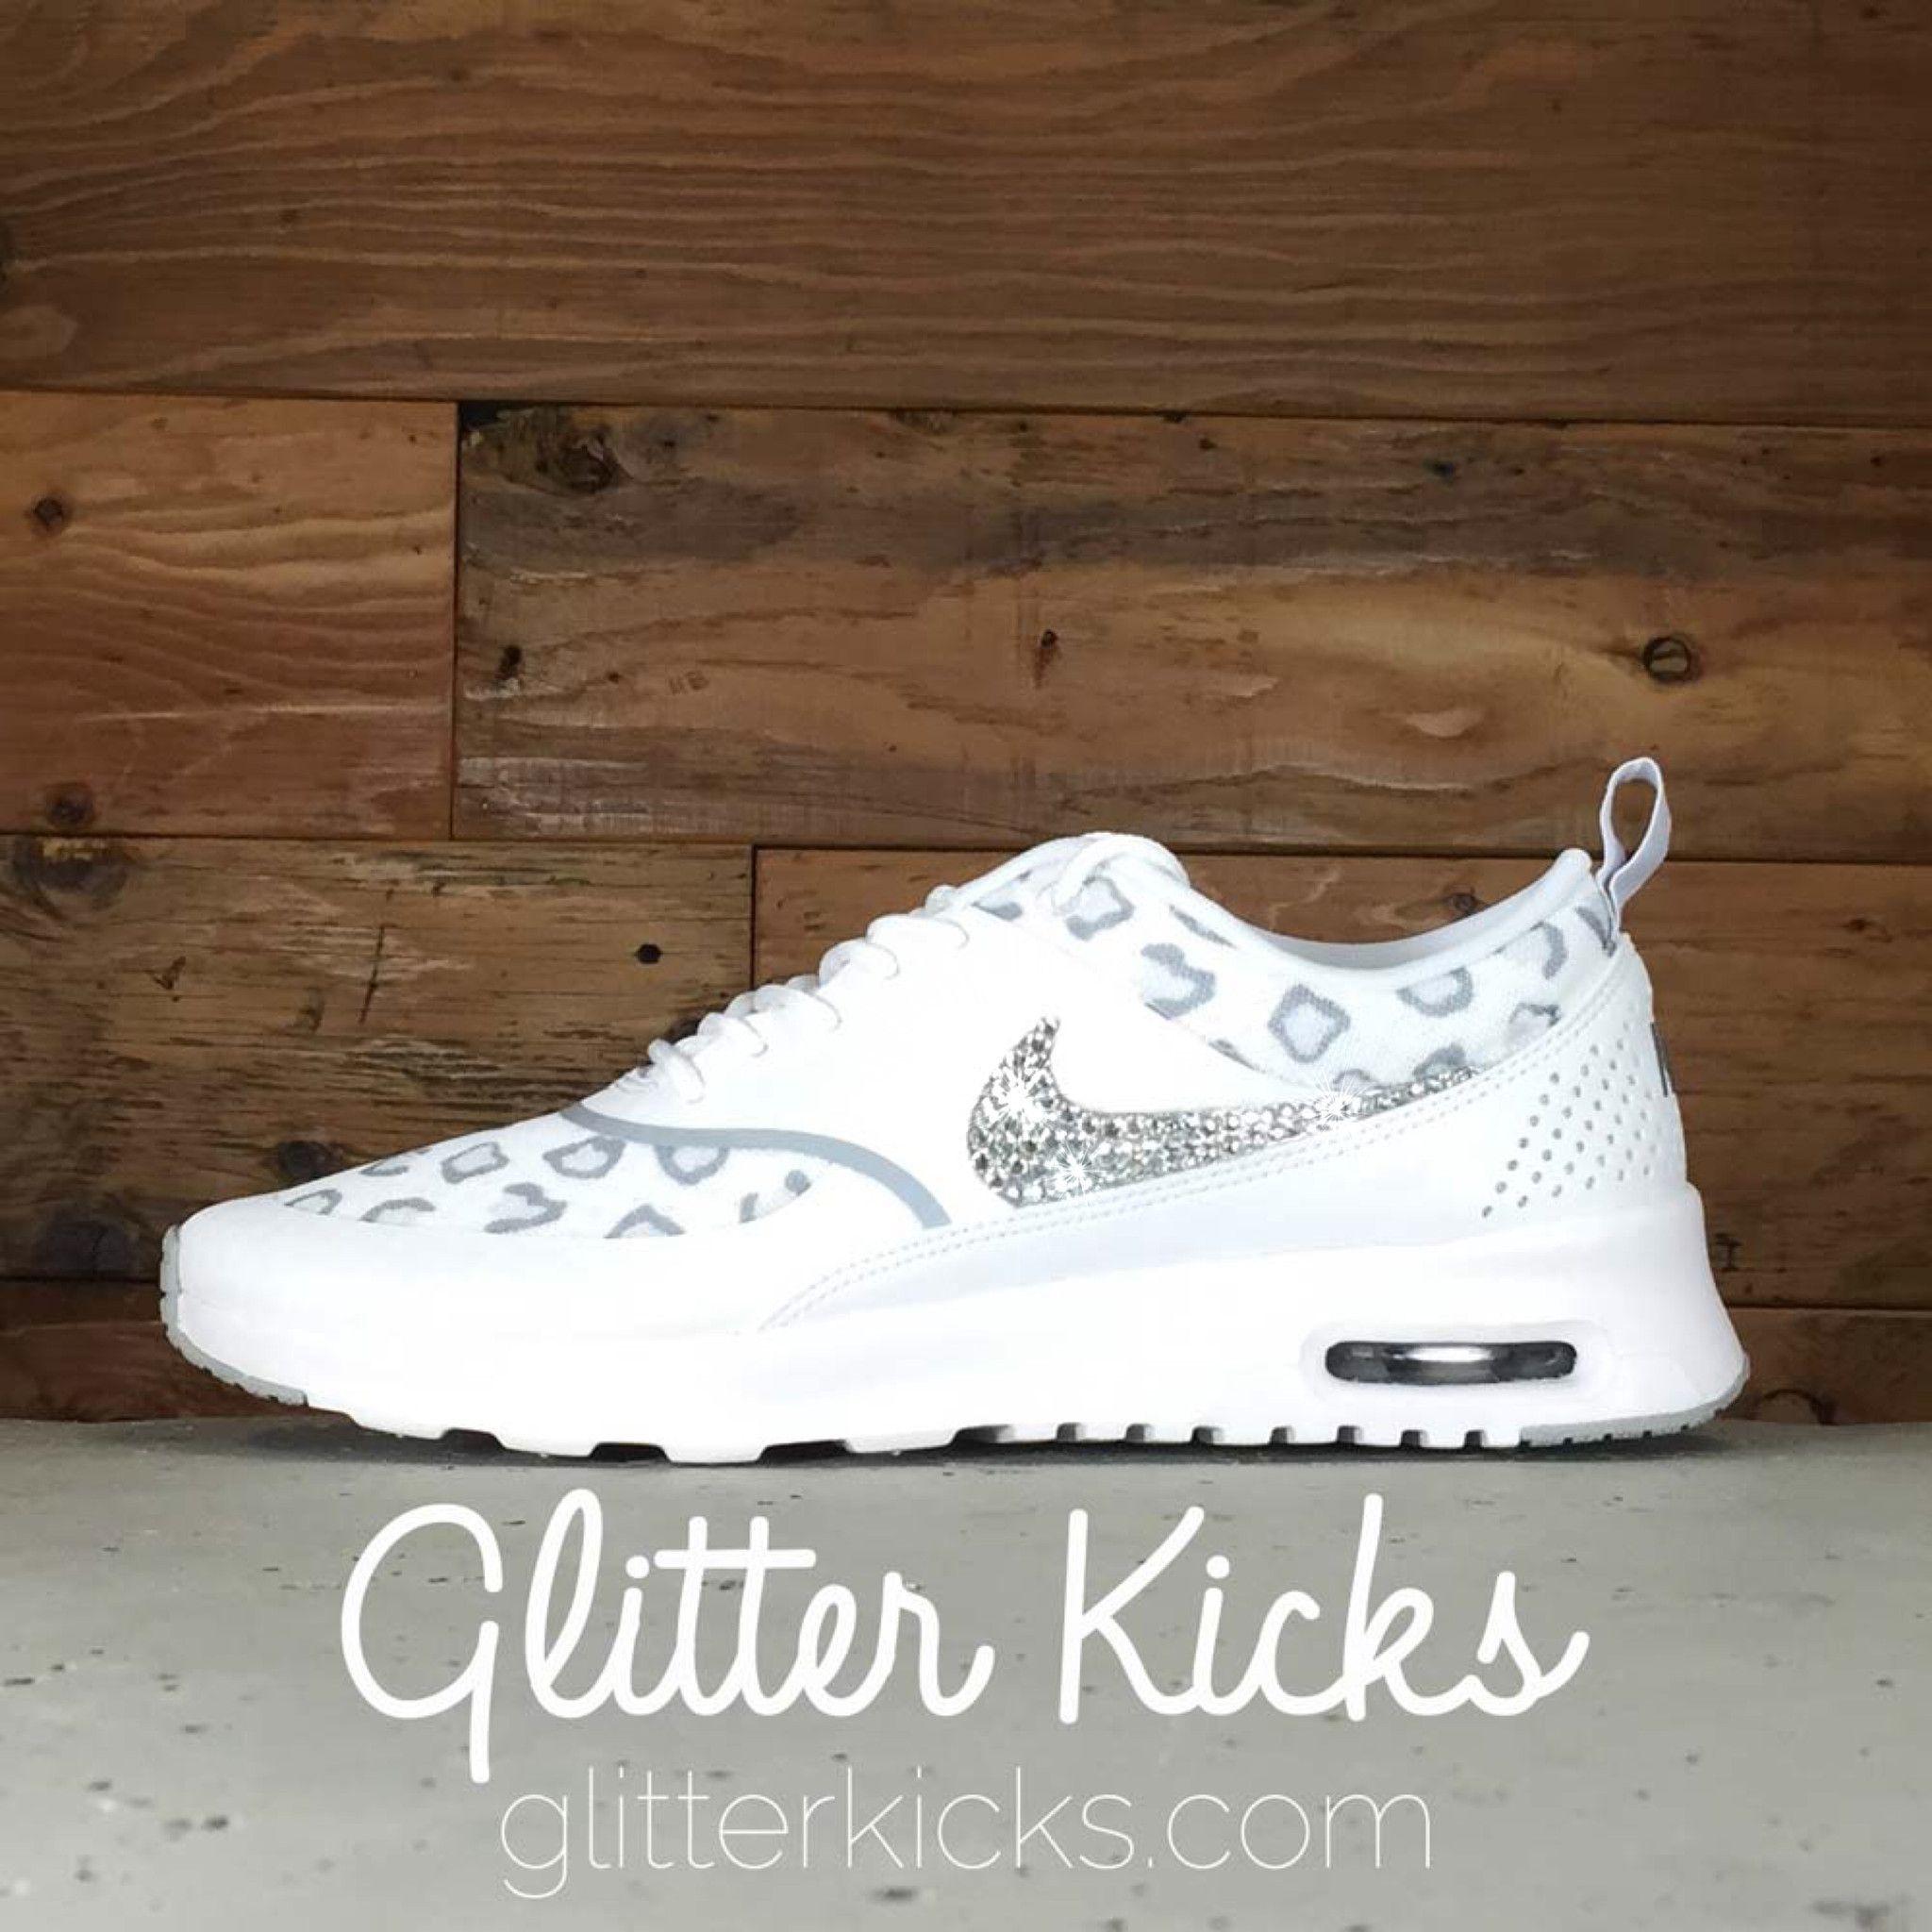 Nike Air Max Thea + Crystals from Glitter Kicks